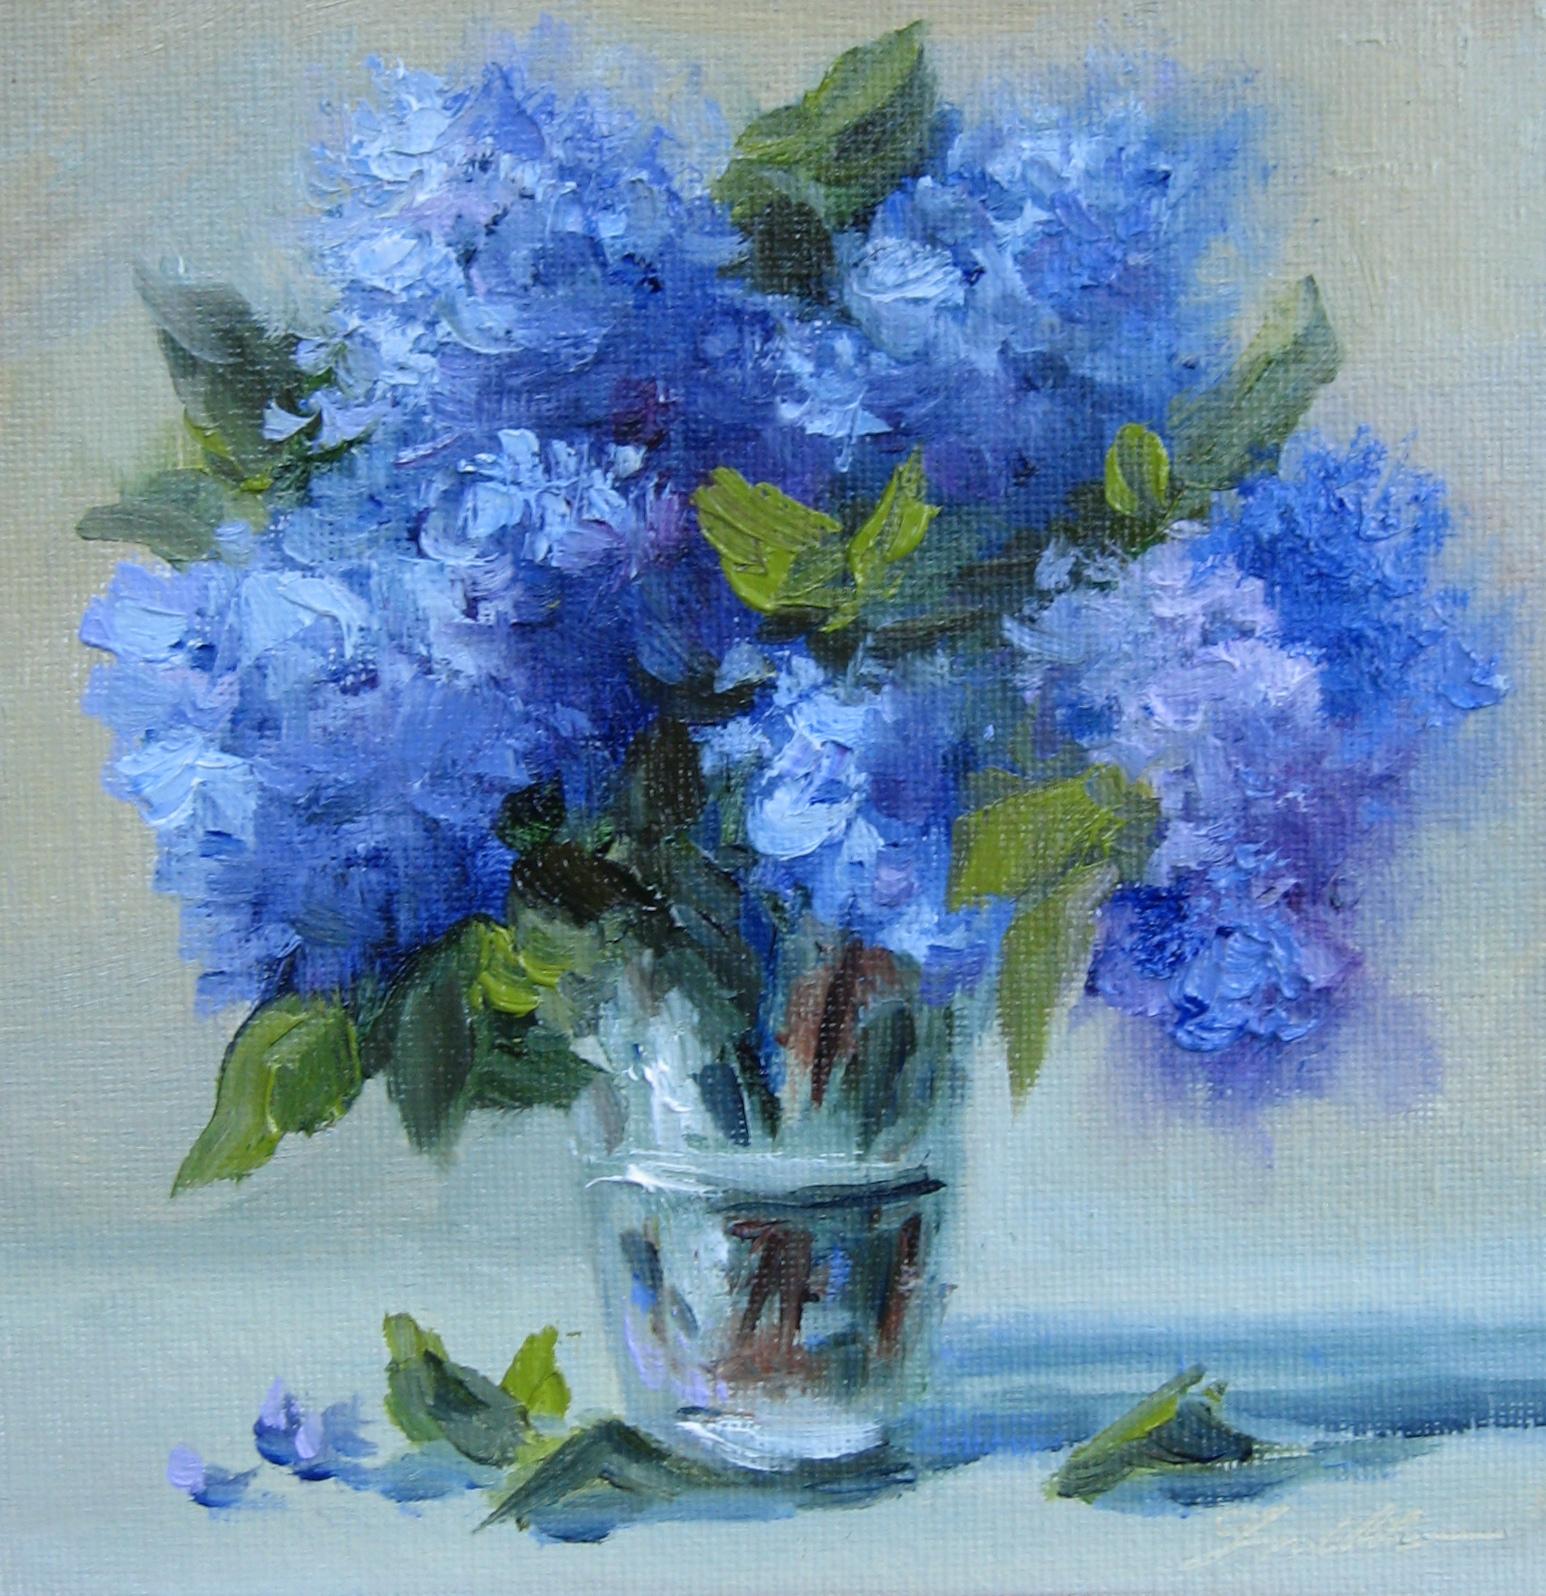 Pat fiorello art elevates life flower study 26 blue hydrangeas flower study 26 blue hydrangeas in a glass vase reviewsmspy